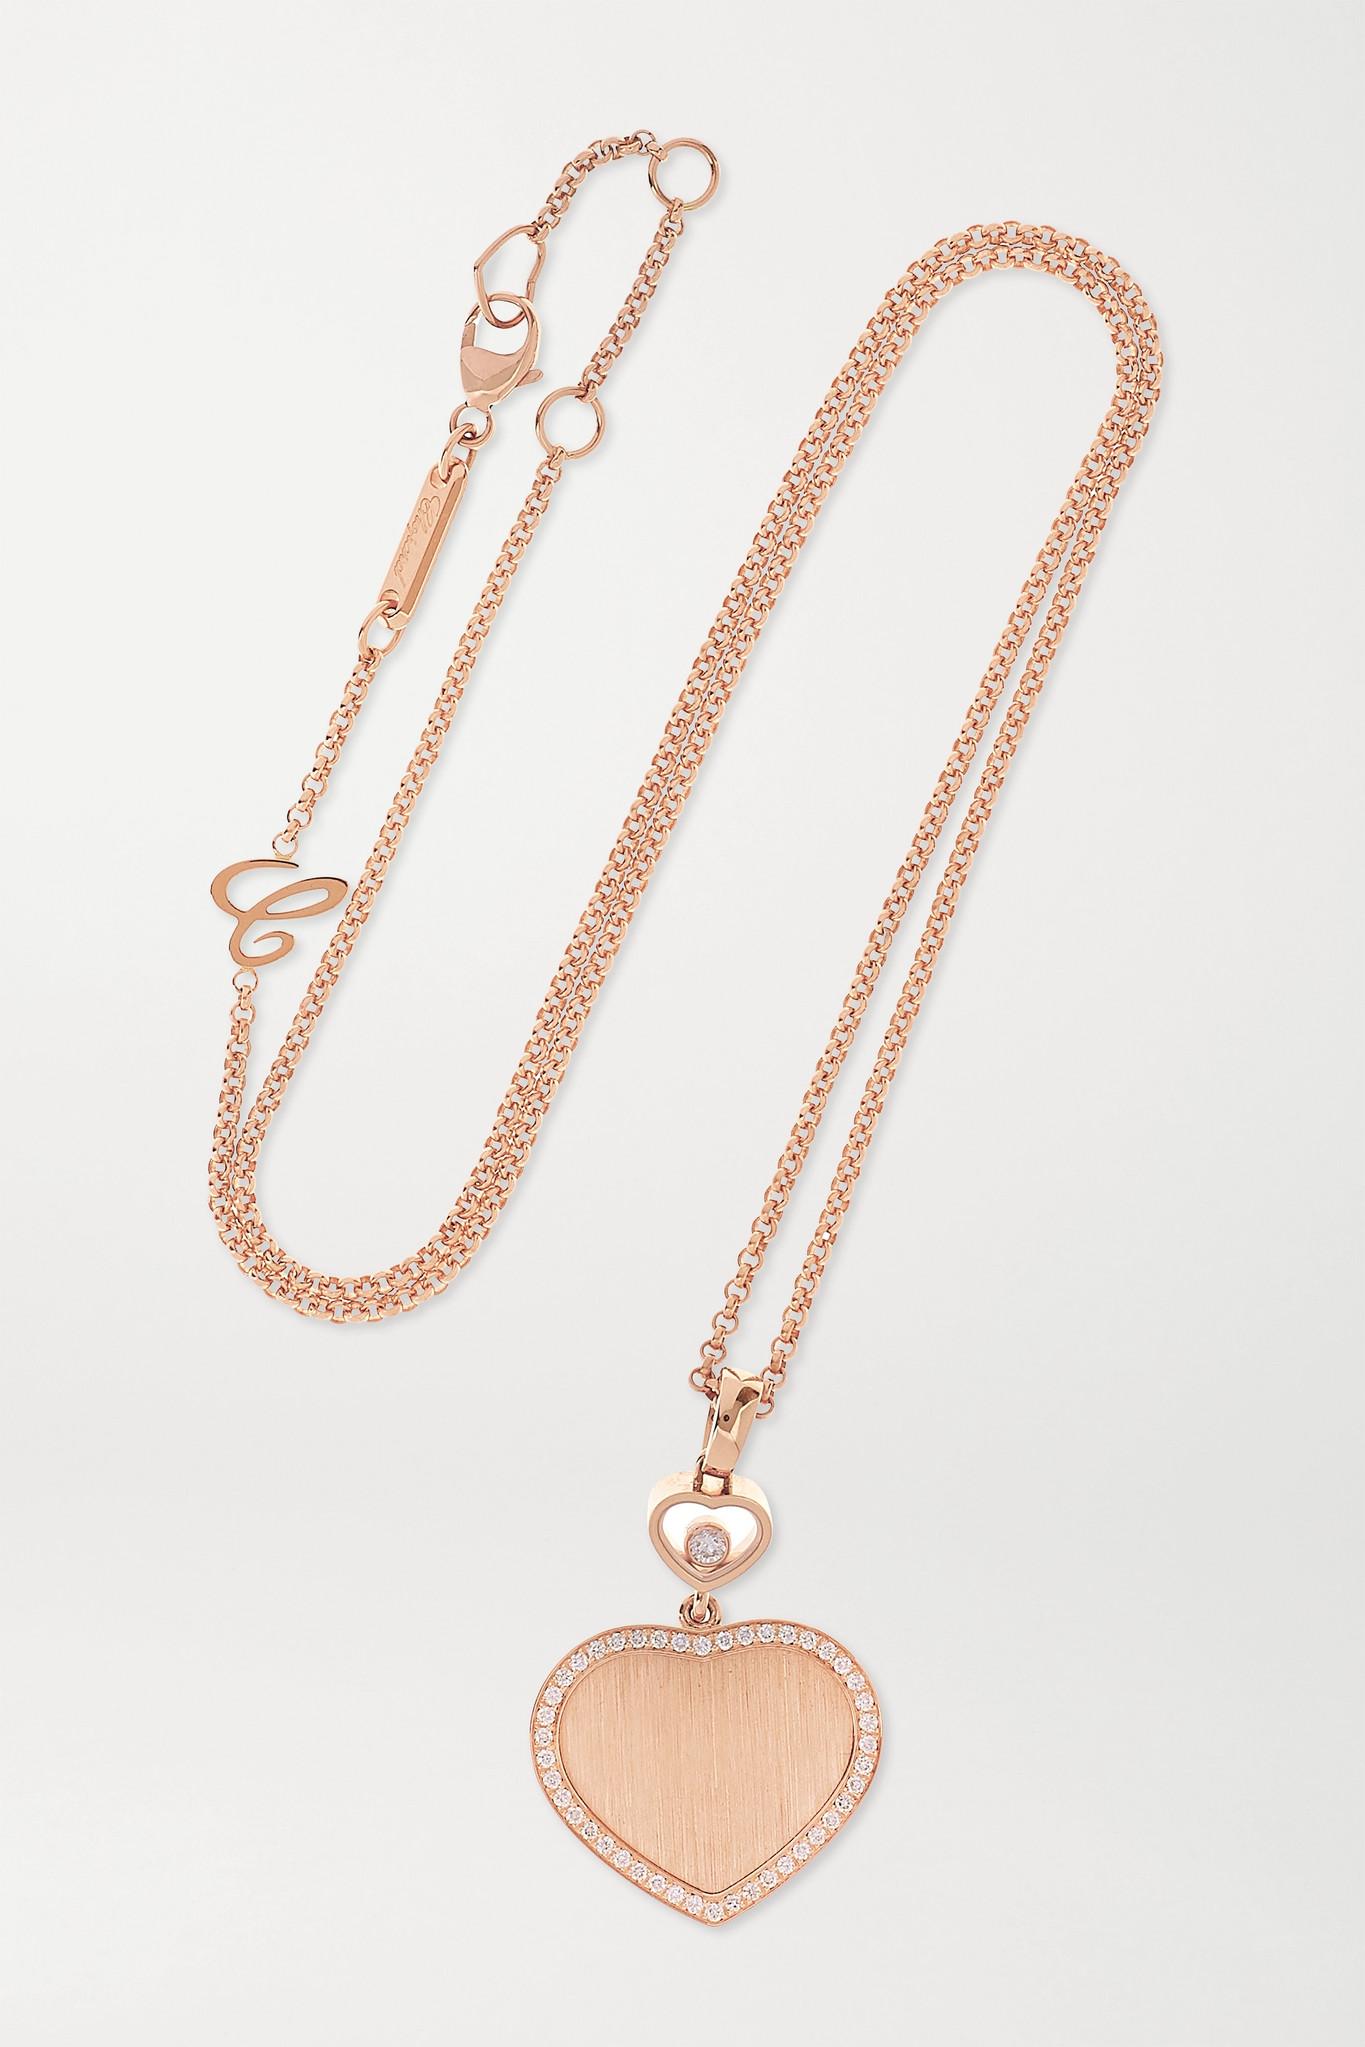 CHOPARD - + 007 Happy Hearts Golden Hearts 18-karat Rose Gold Diamond Necklace - one size